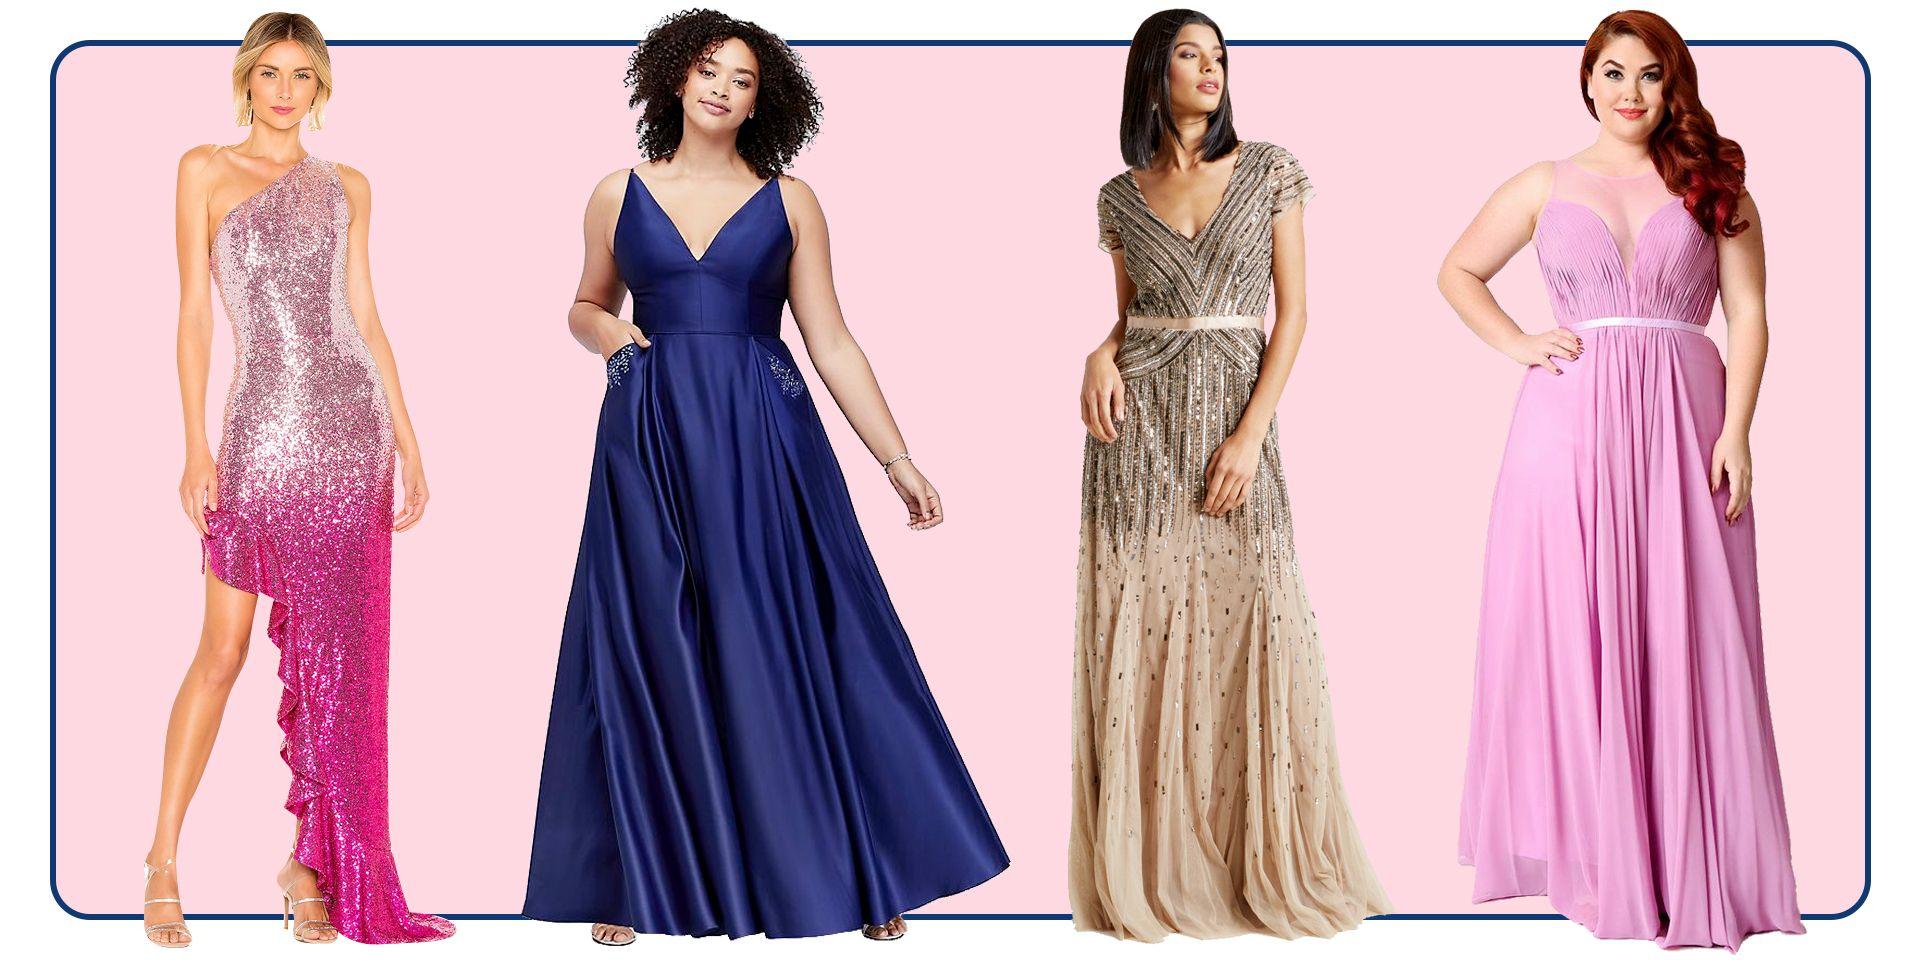 26 Best Cheap Prom Dresses 2019